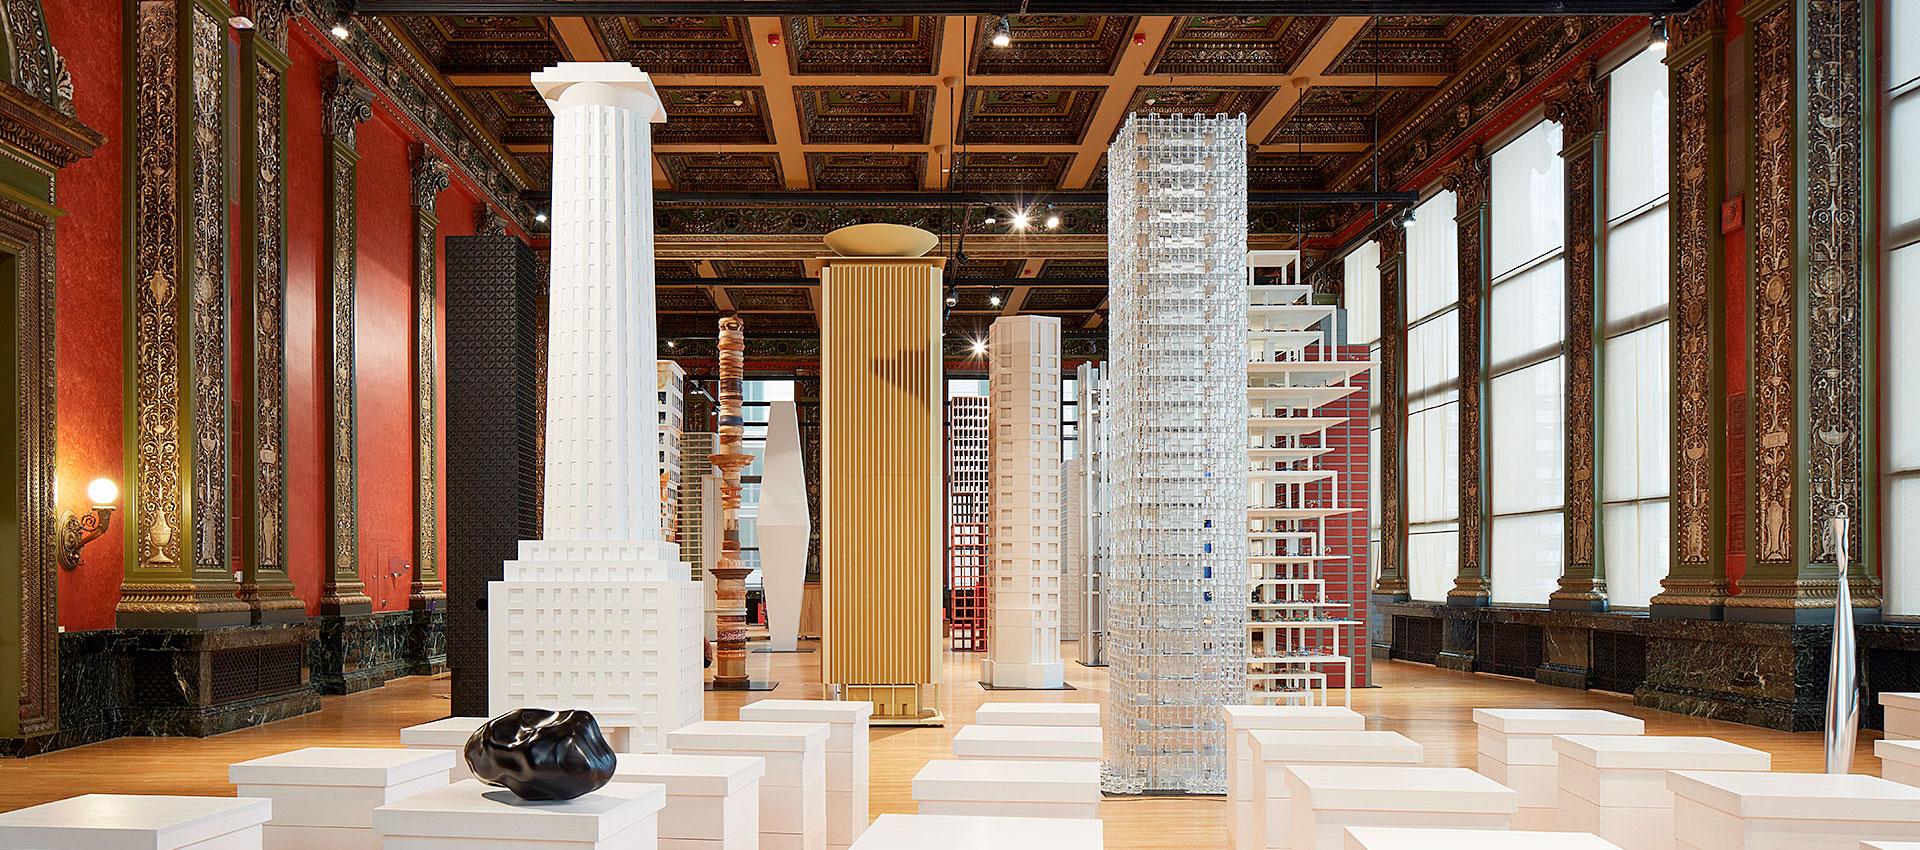 Vertical City exposición en Chicago Architecture Biennial 2017. Fotografía por Steven Hall